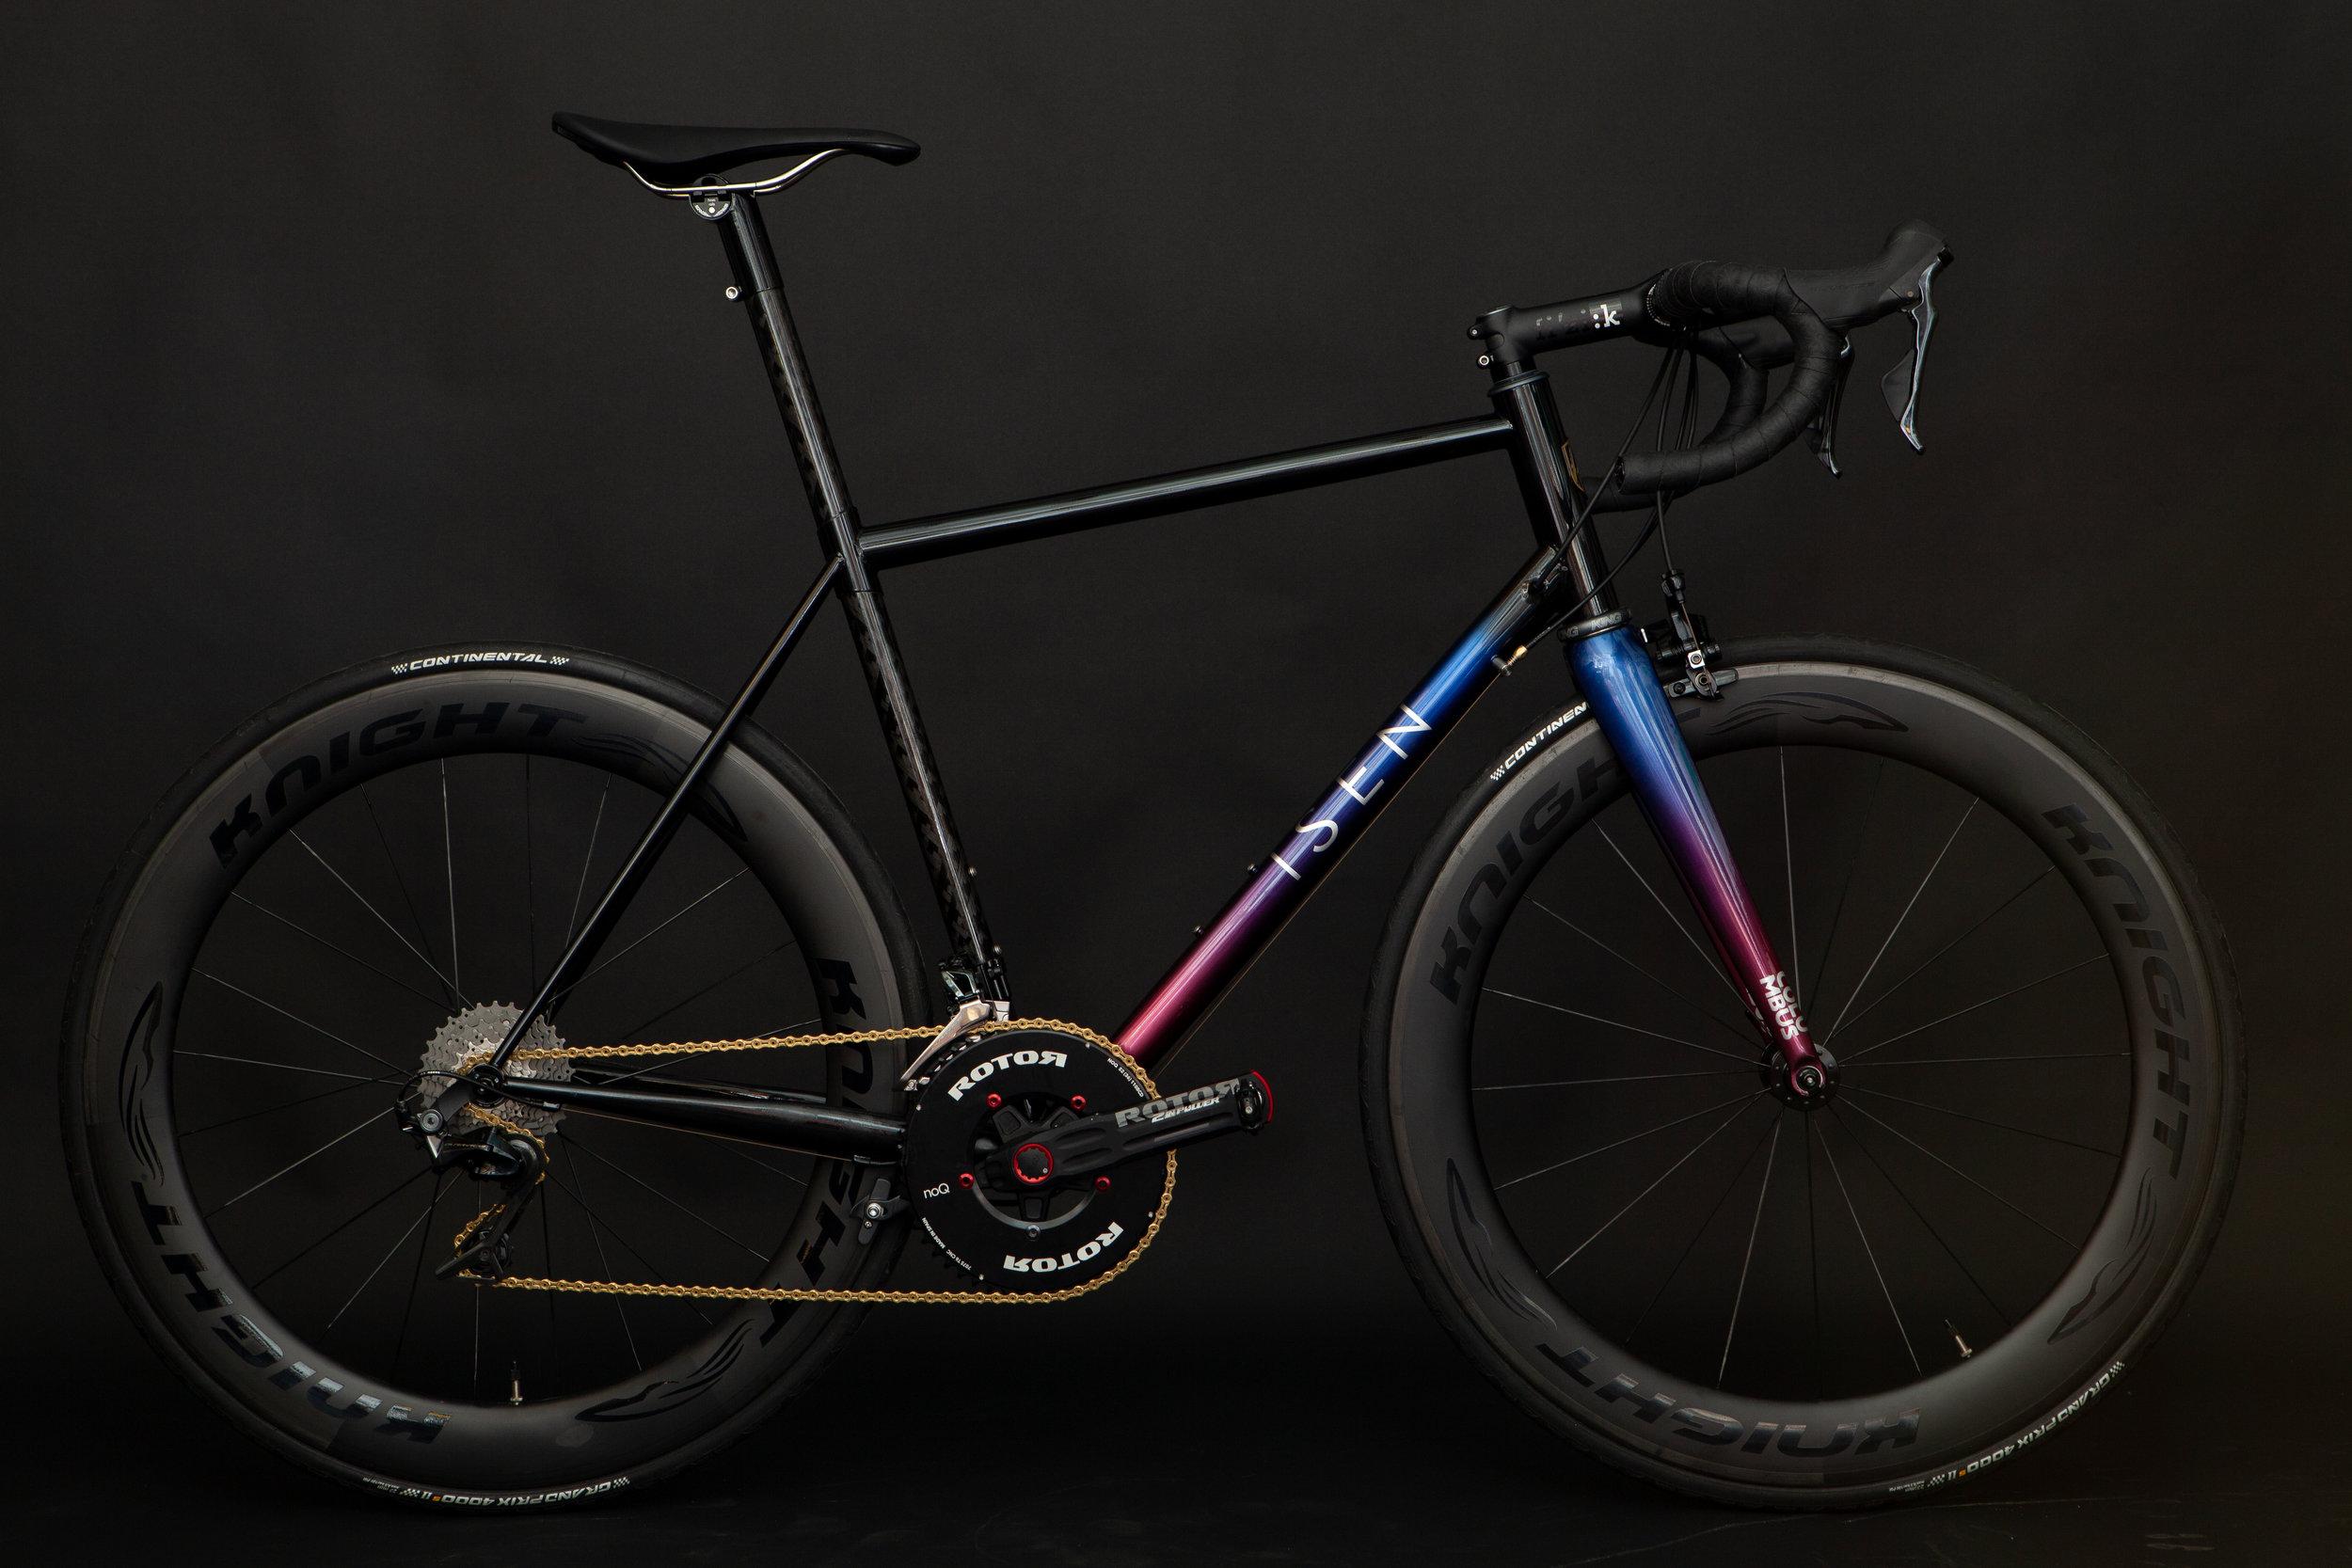 Bikes and Frames - order complete bikes or framesets here